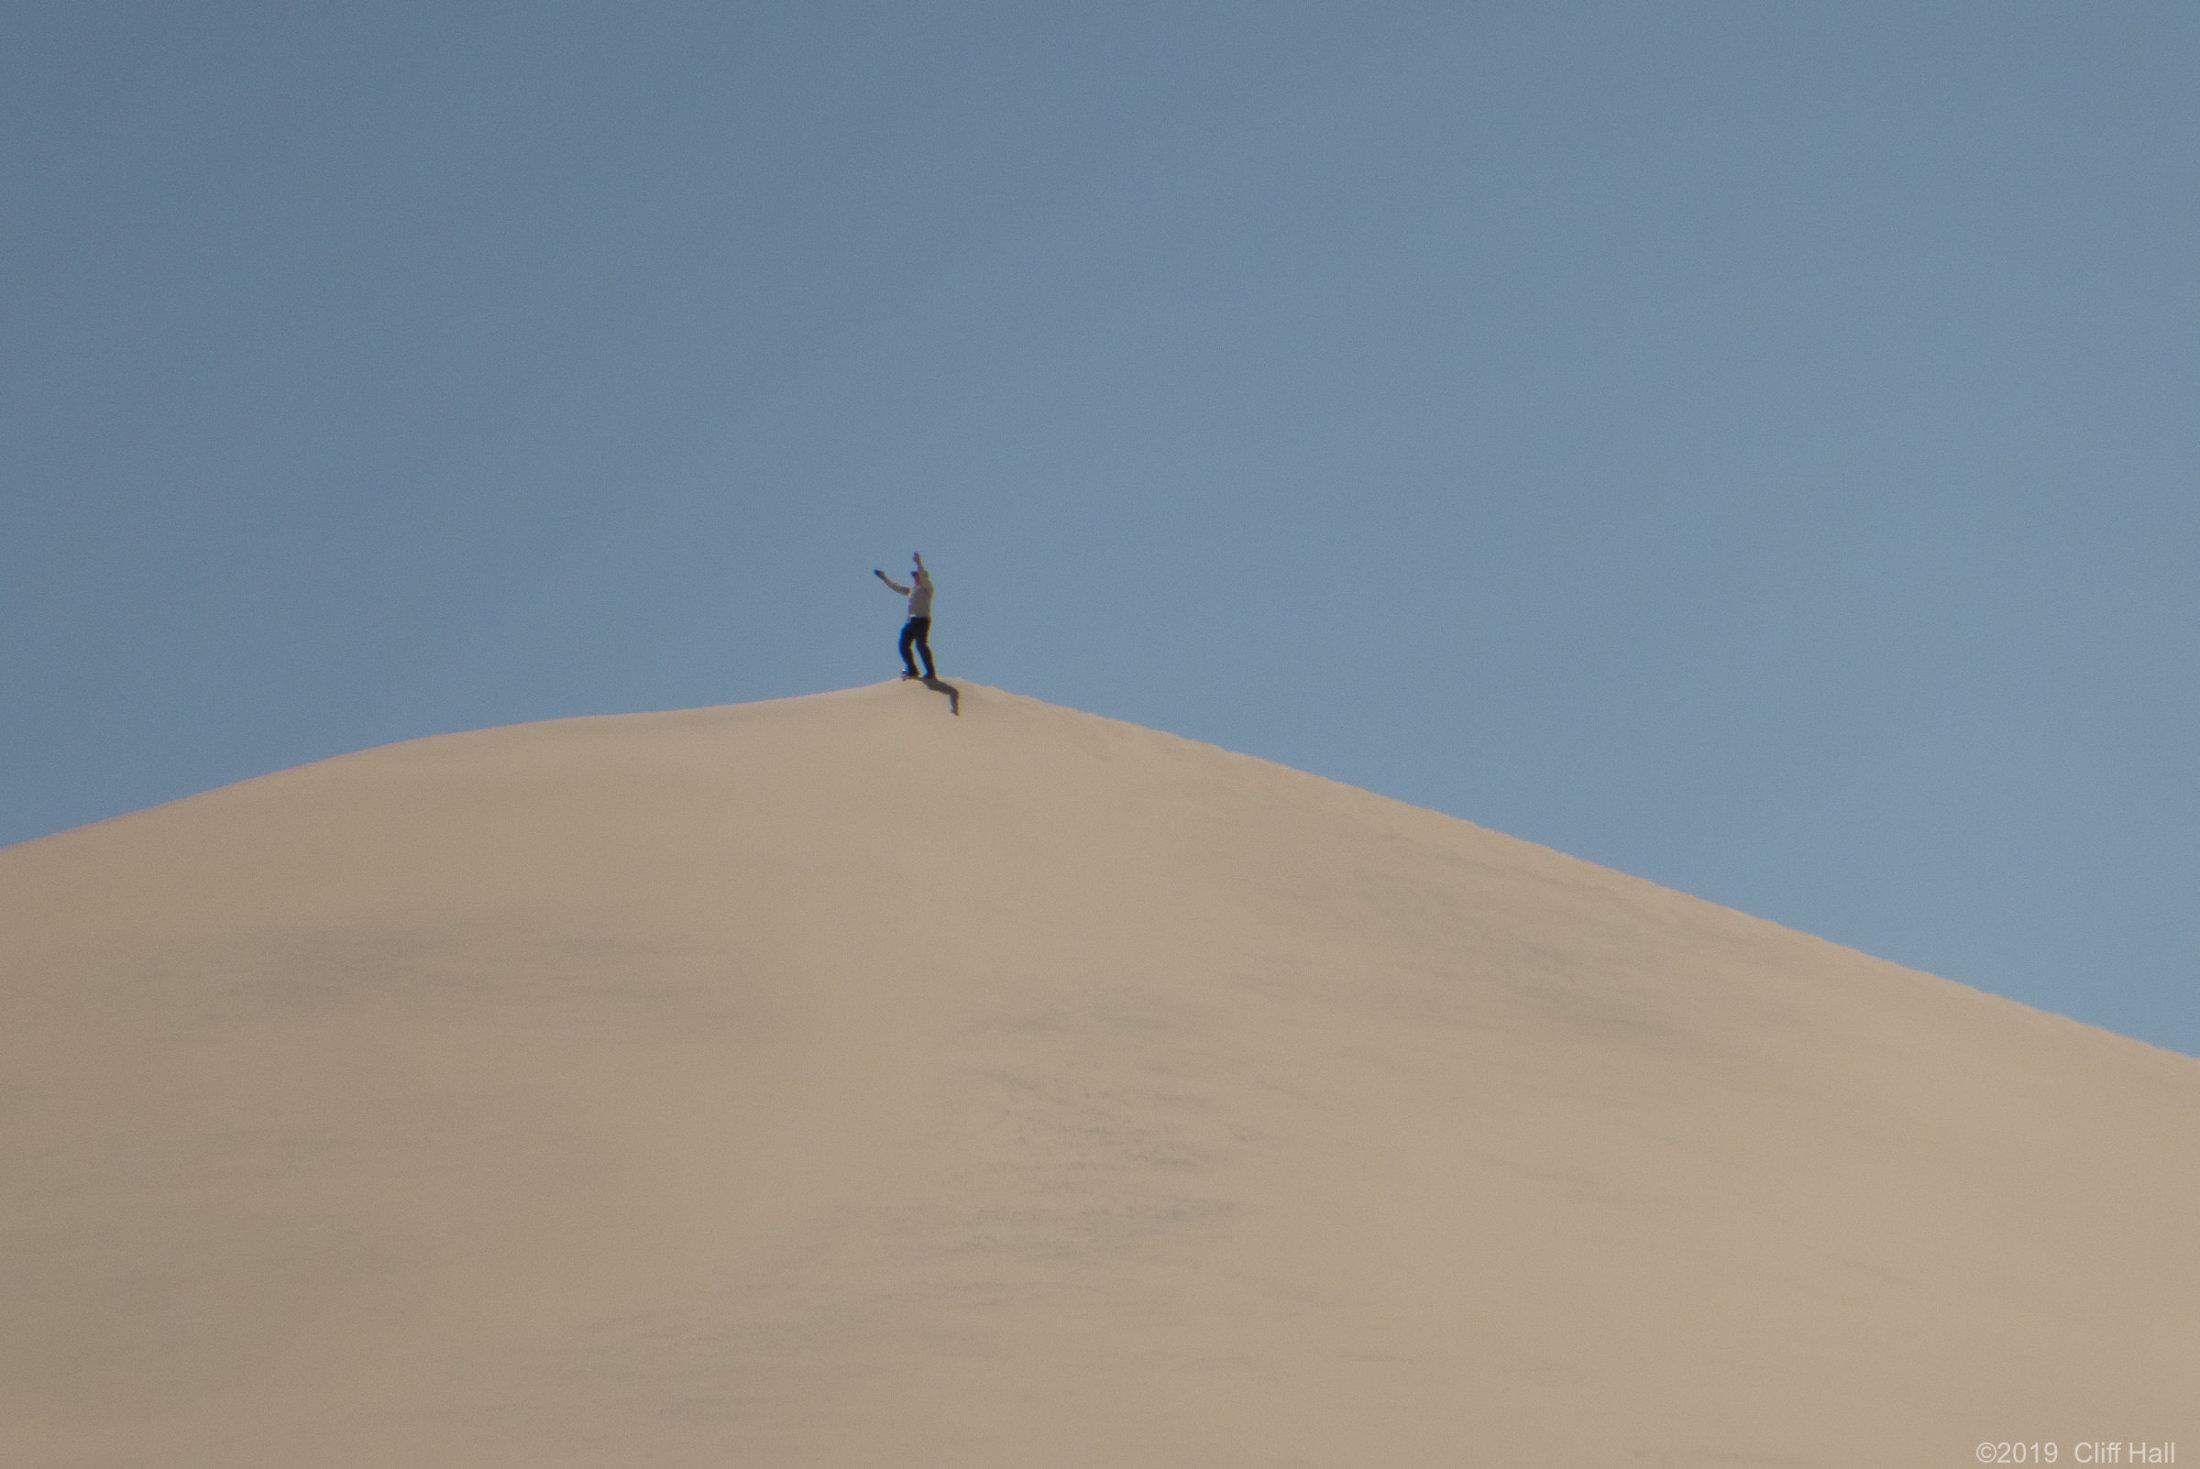 That is a big sandbox